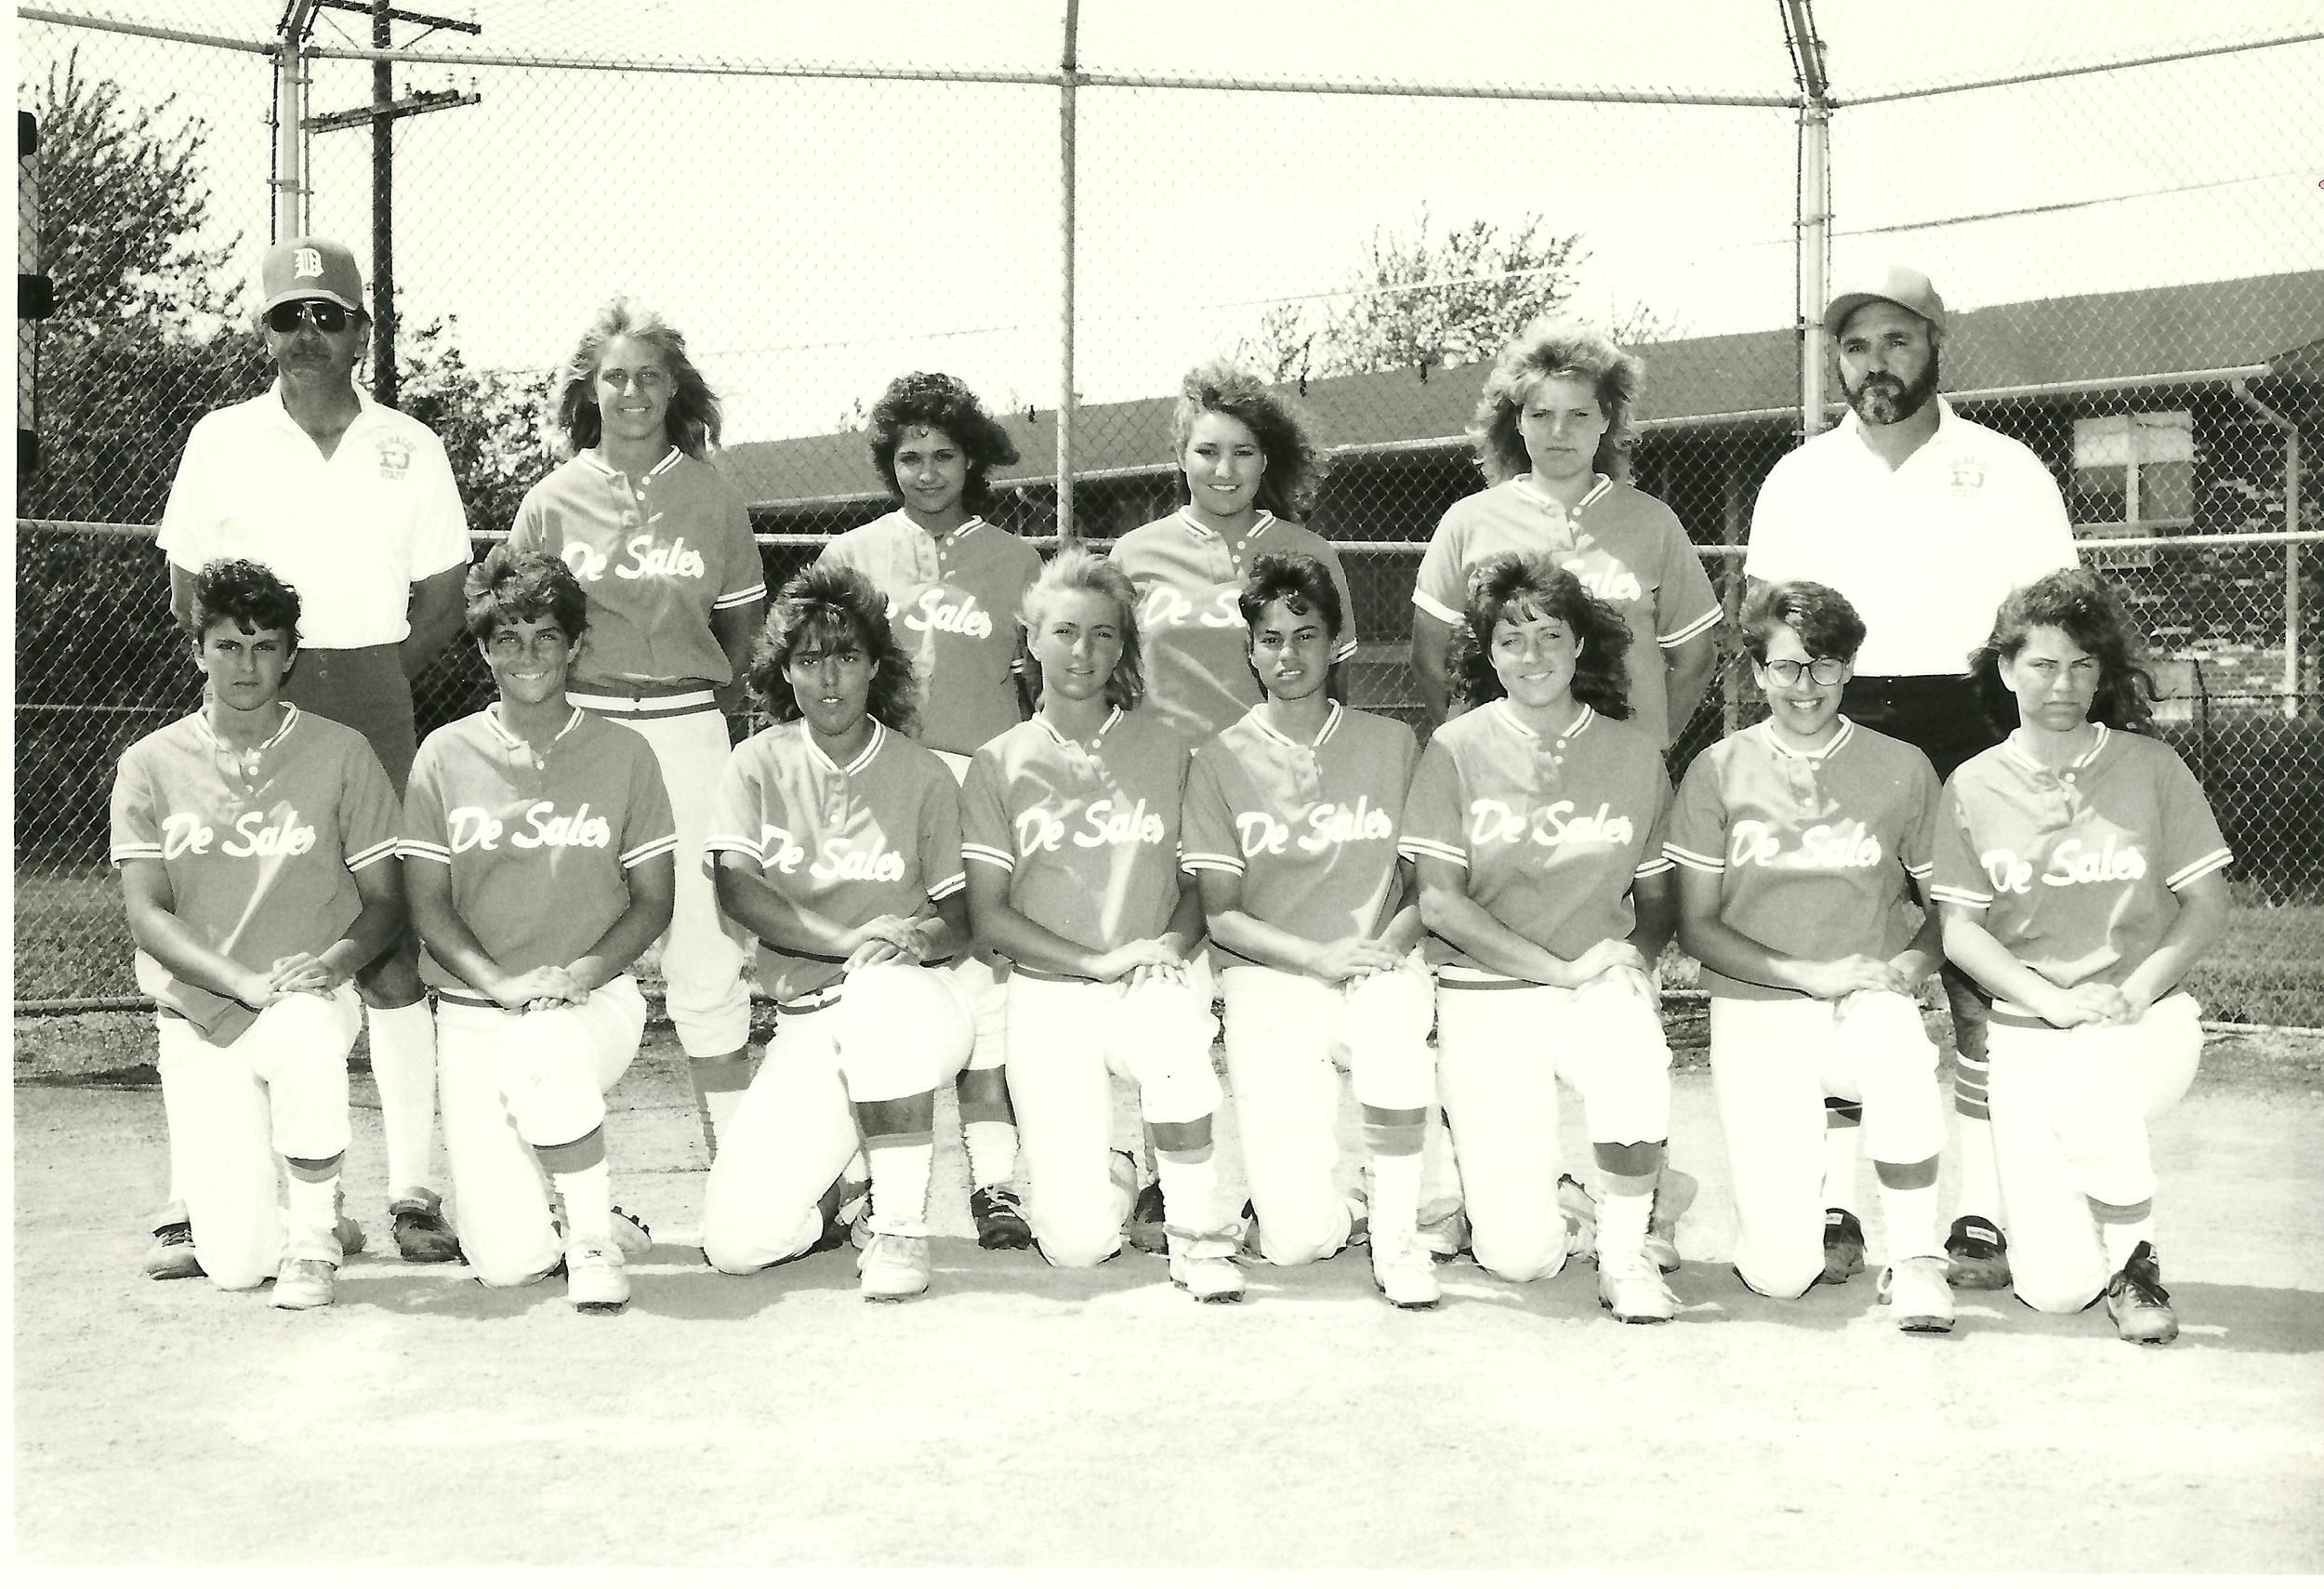 1988 OCL Champions